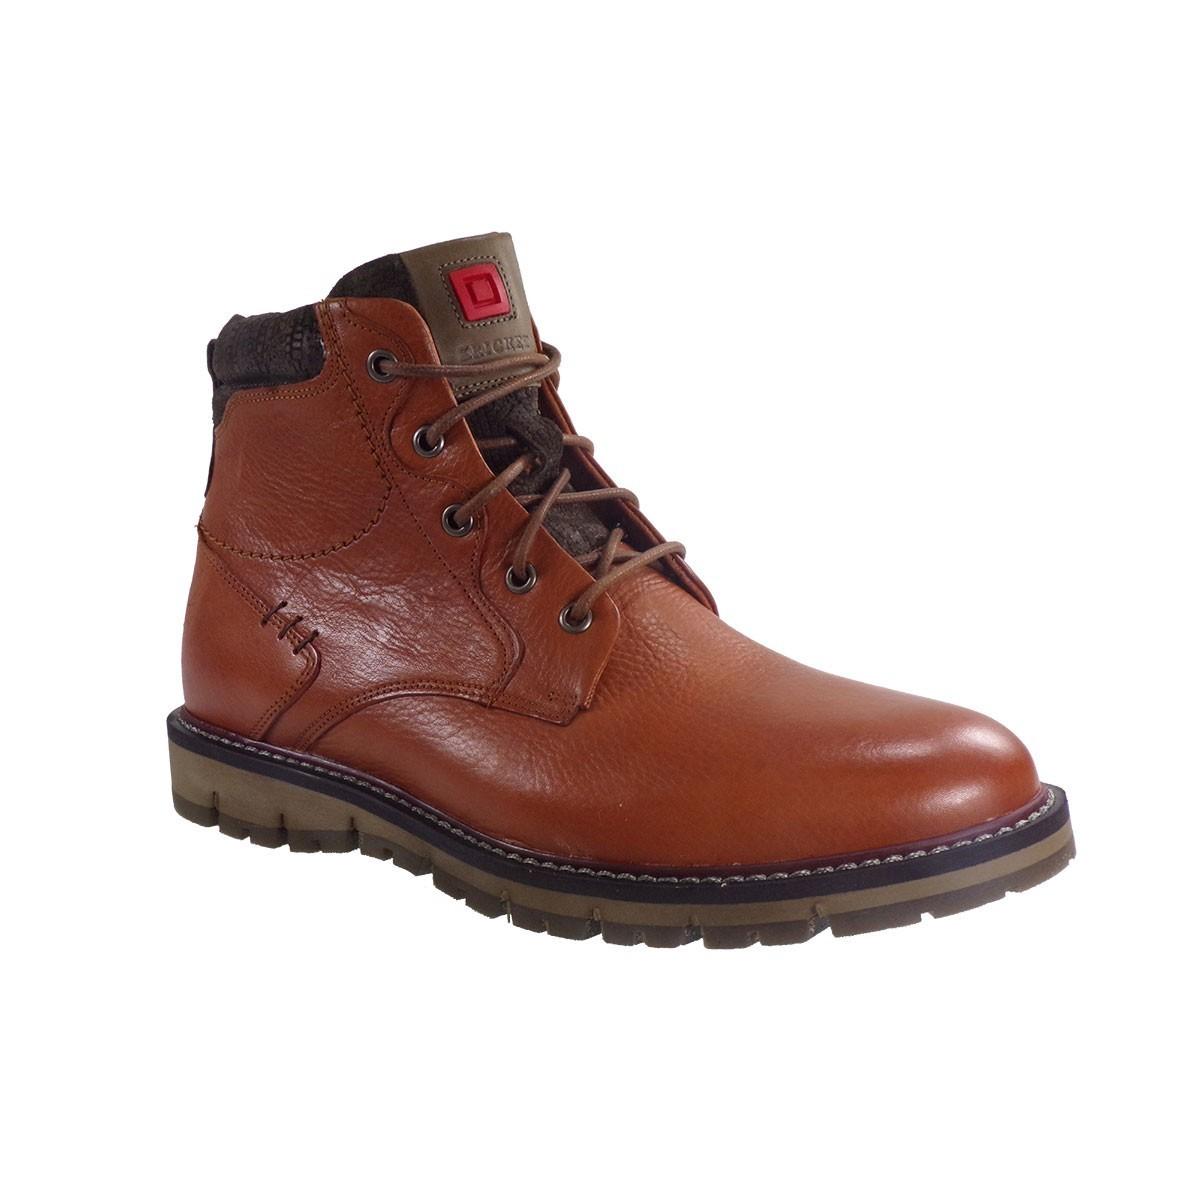 e421cf85b00 Kricket Shoes Ανδρικά Μποτάκια Αρβυλάκια 3500 Ταμπά Δέρμα |Γυναικεία ...